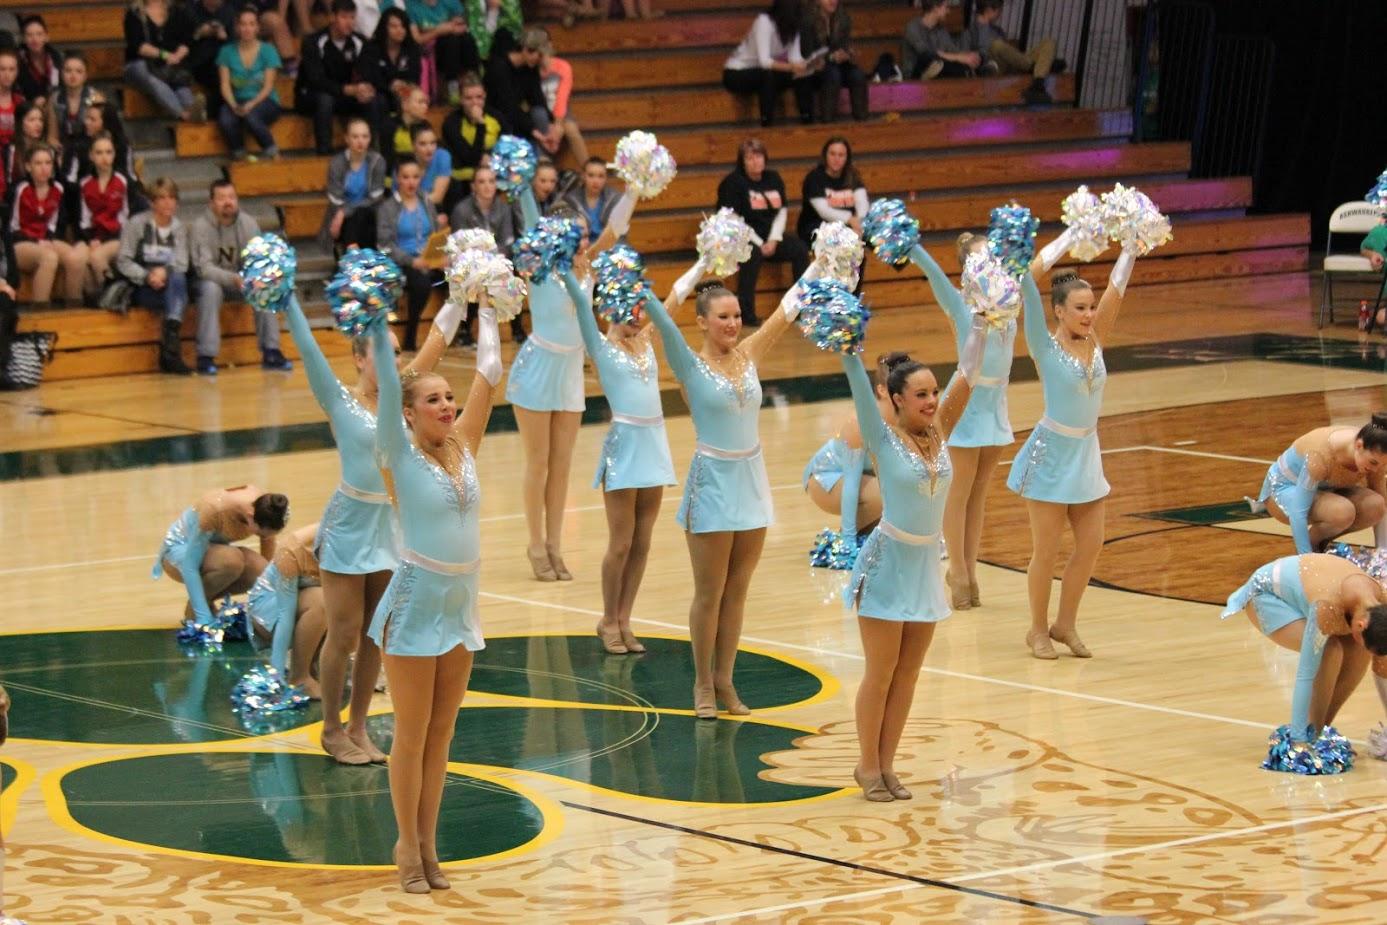 Mukwonago High School Dance Team Custom Pom Uniforms